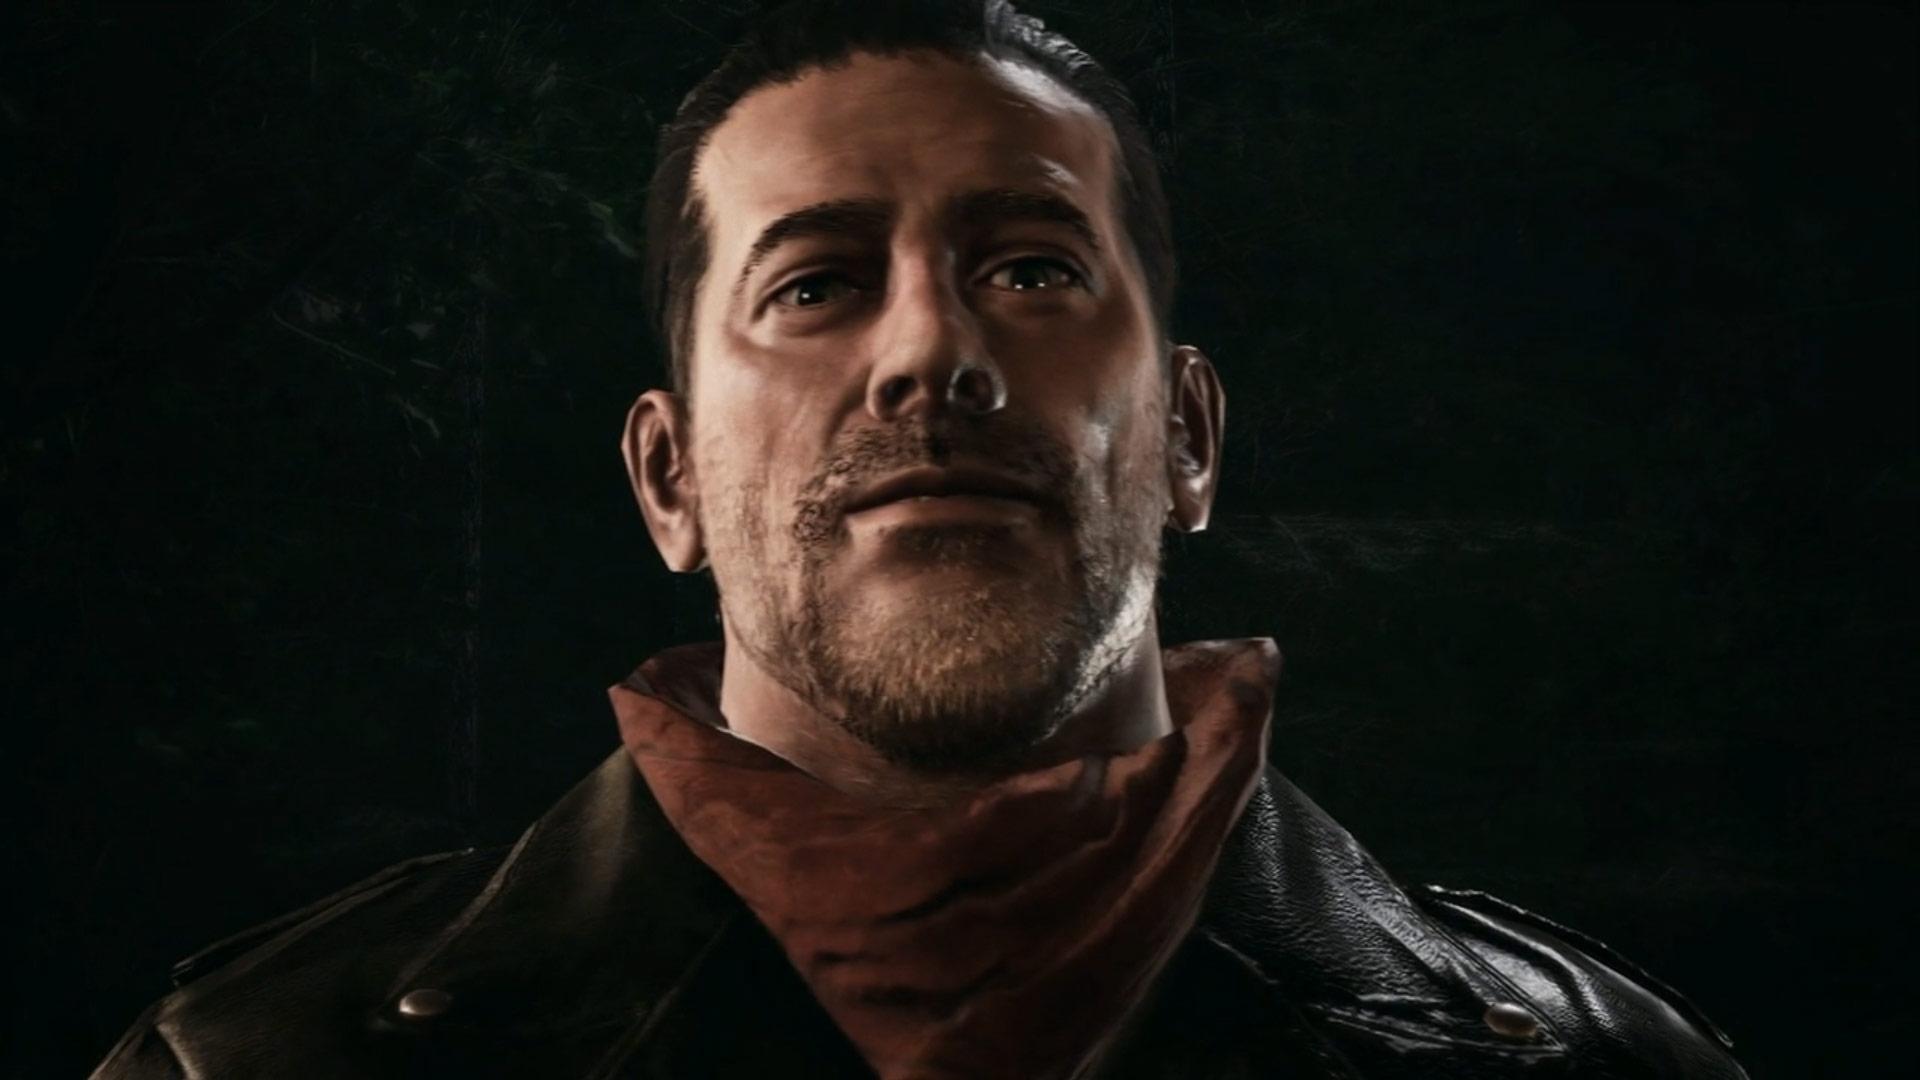 Tekken 7 Julia and Negan Reveal Screenshots 6 out of 12 image gallery